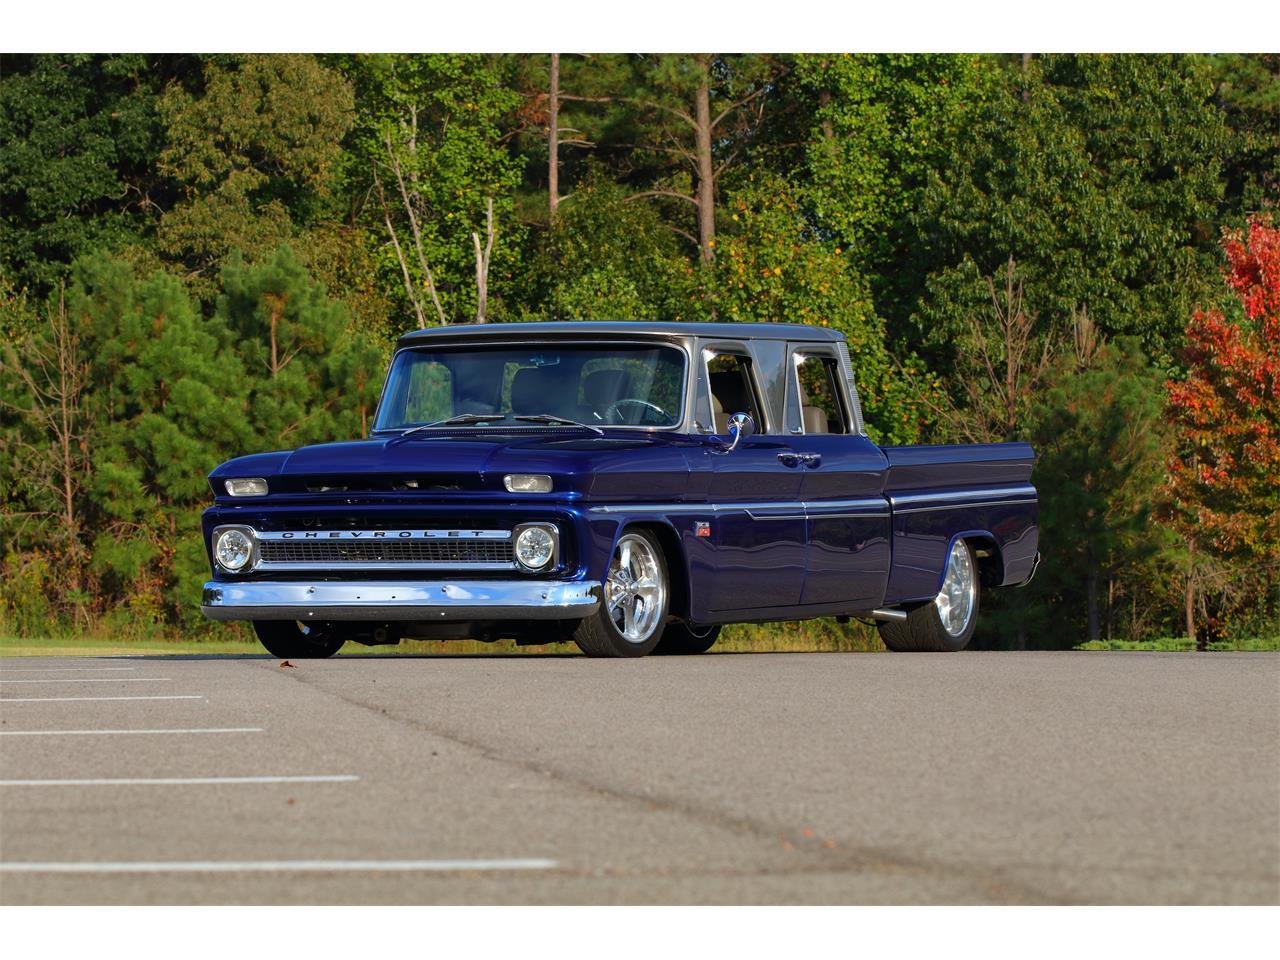 1965 Chevrolet Pickup For Sale Classiccars Com Cc 982237